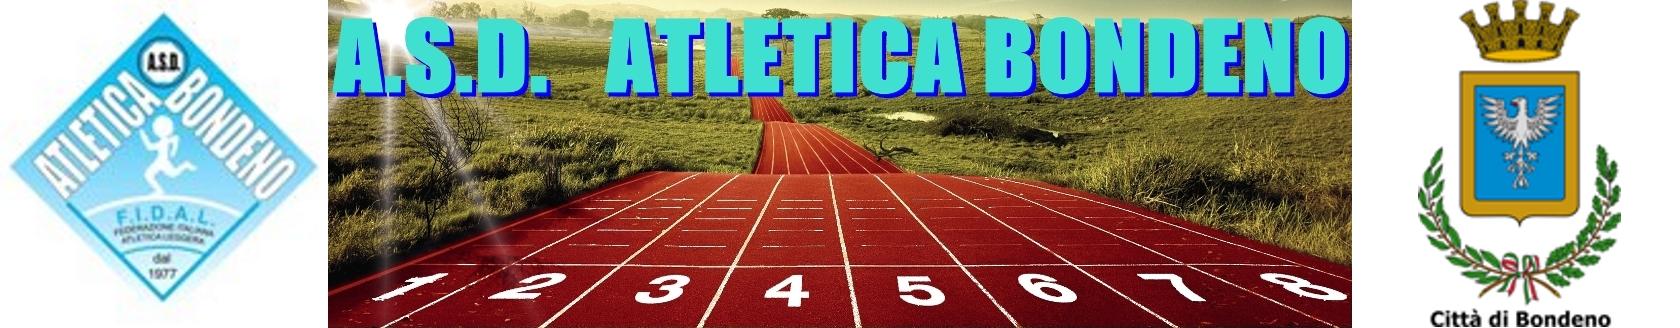 A.S.D. Atletica Bondeno